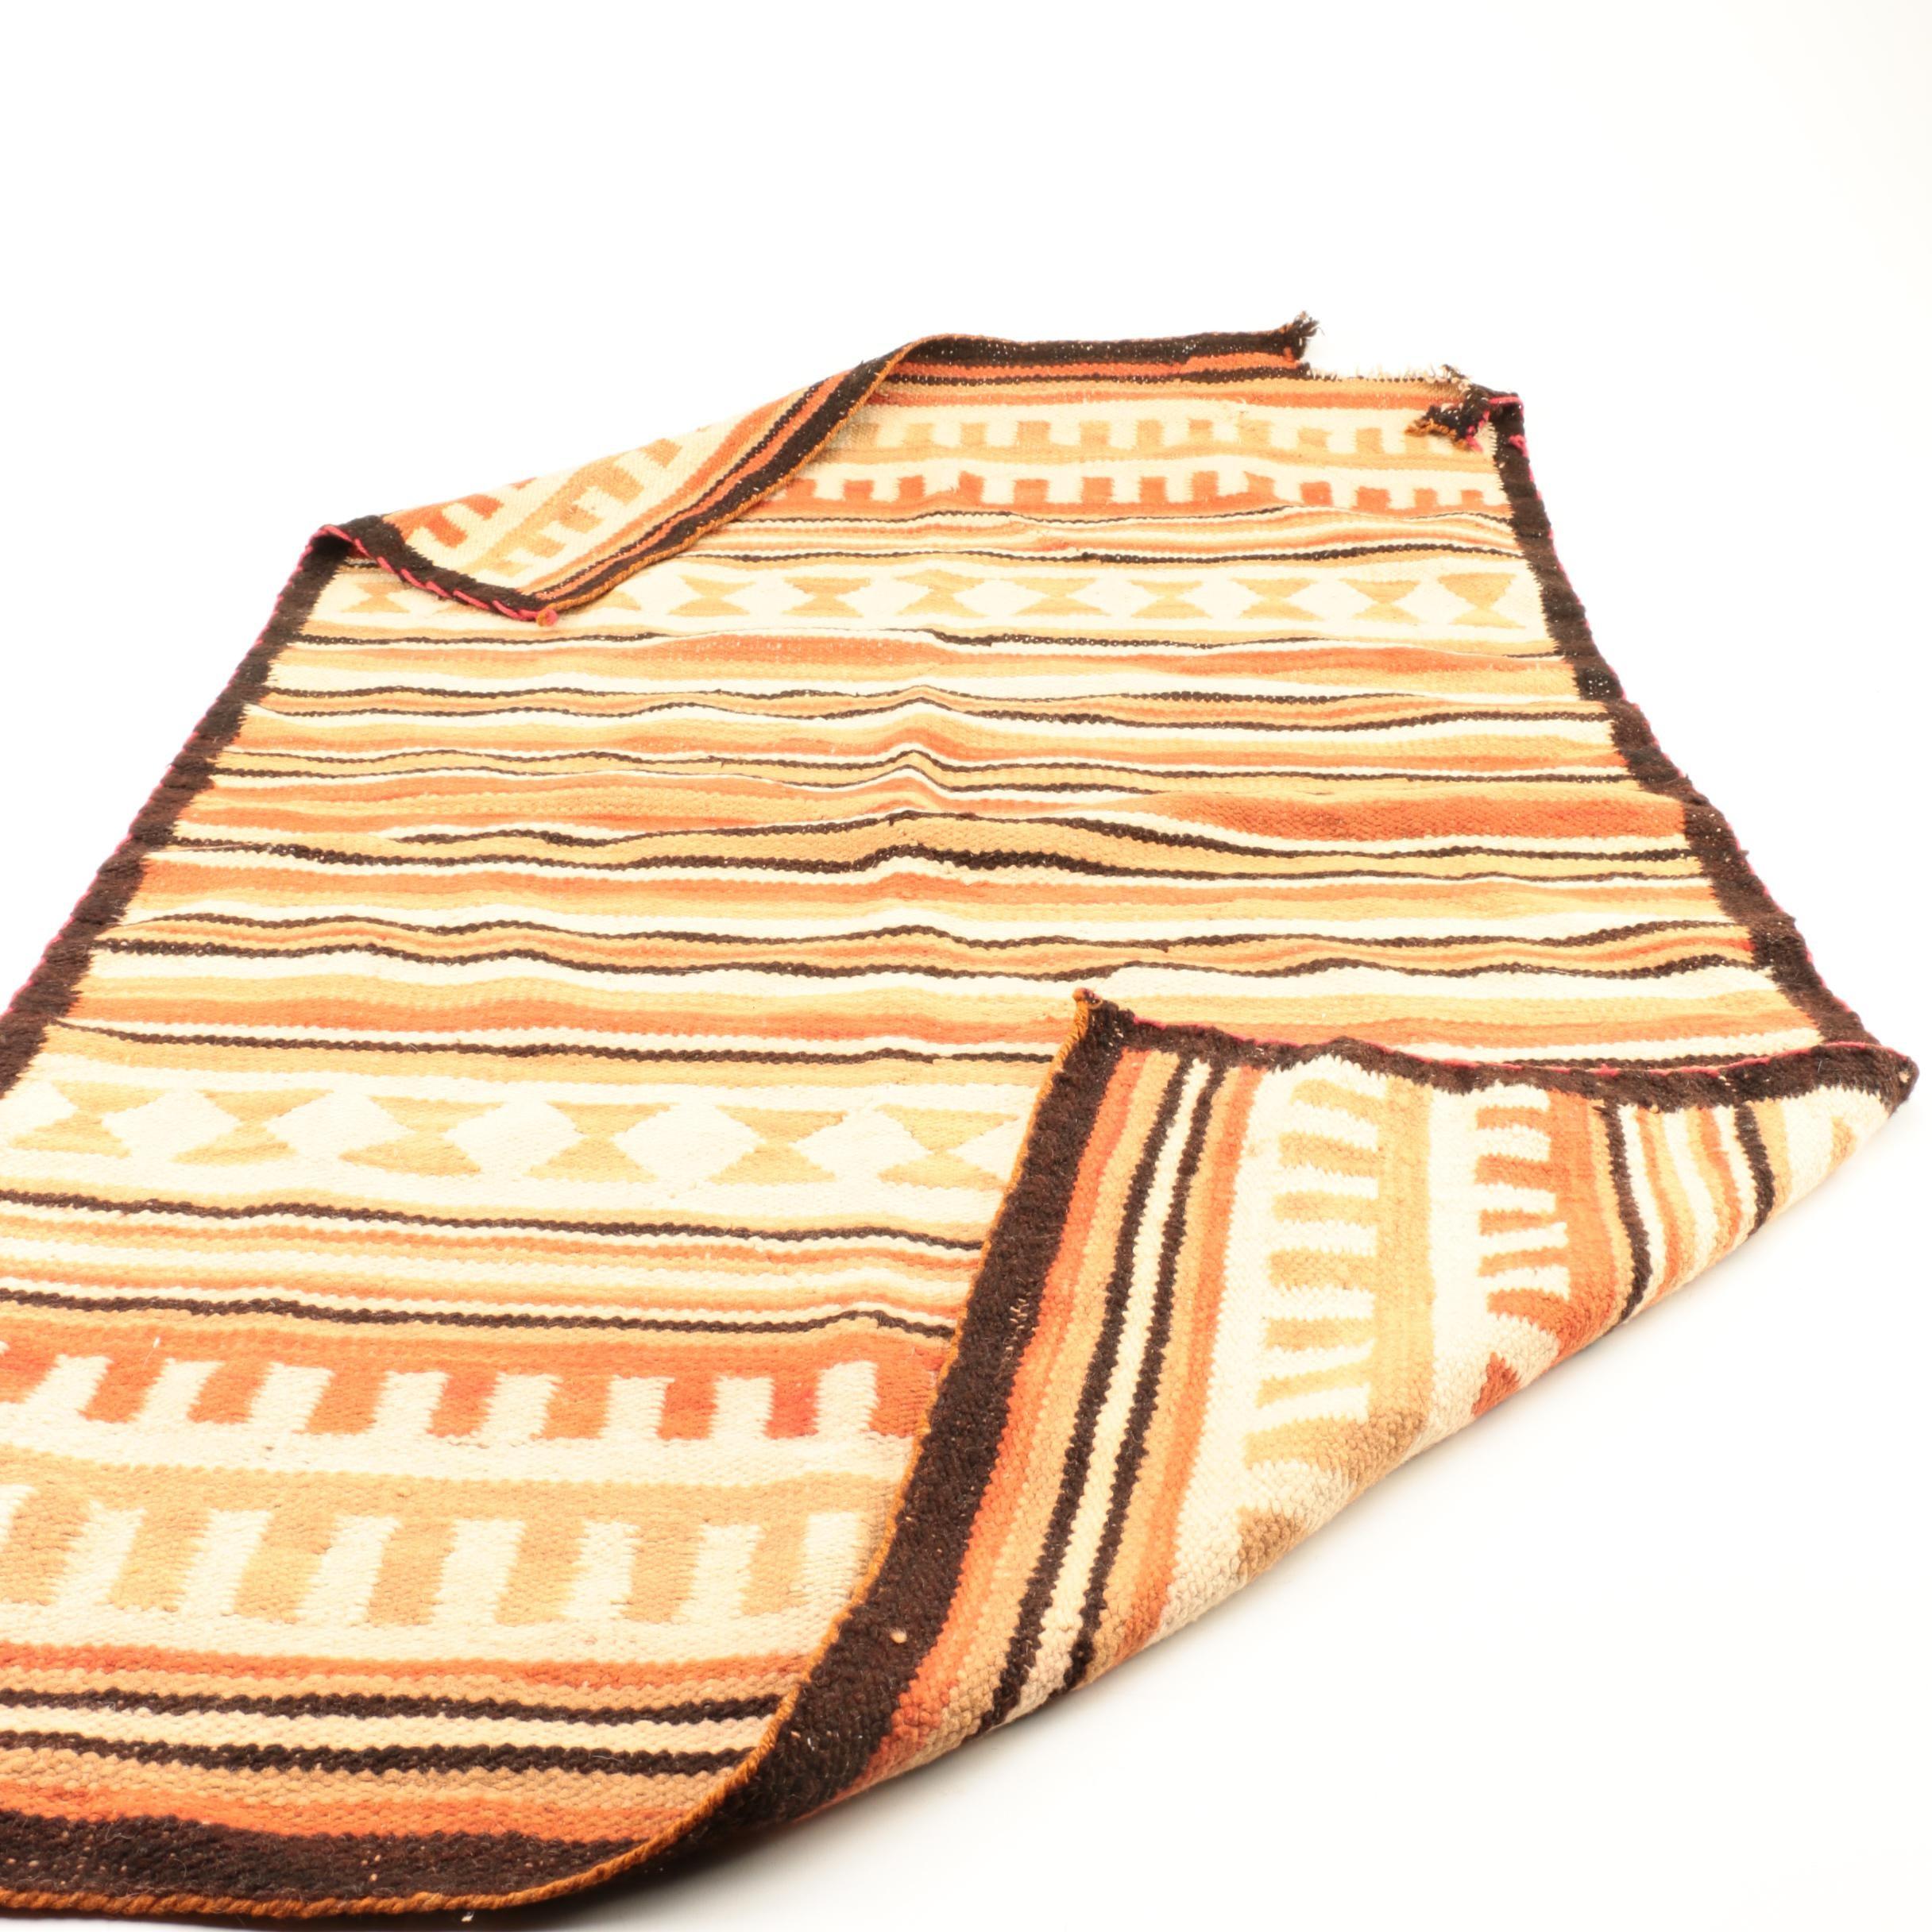 VIntage Handwoven Wool Area Rug